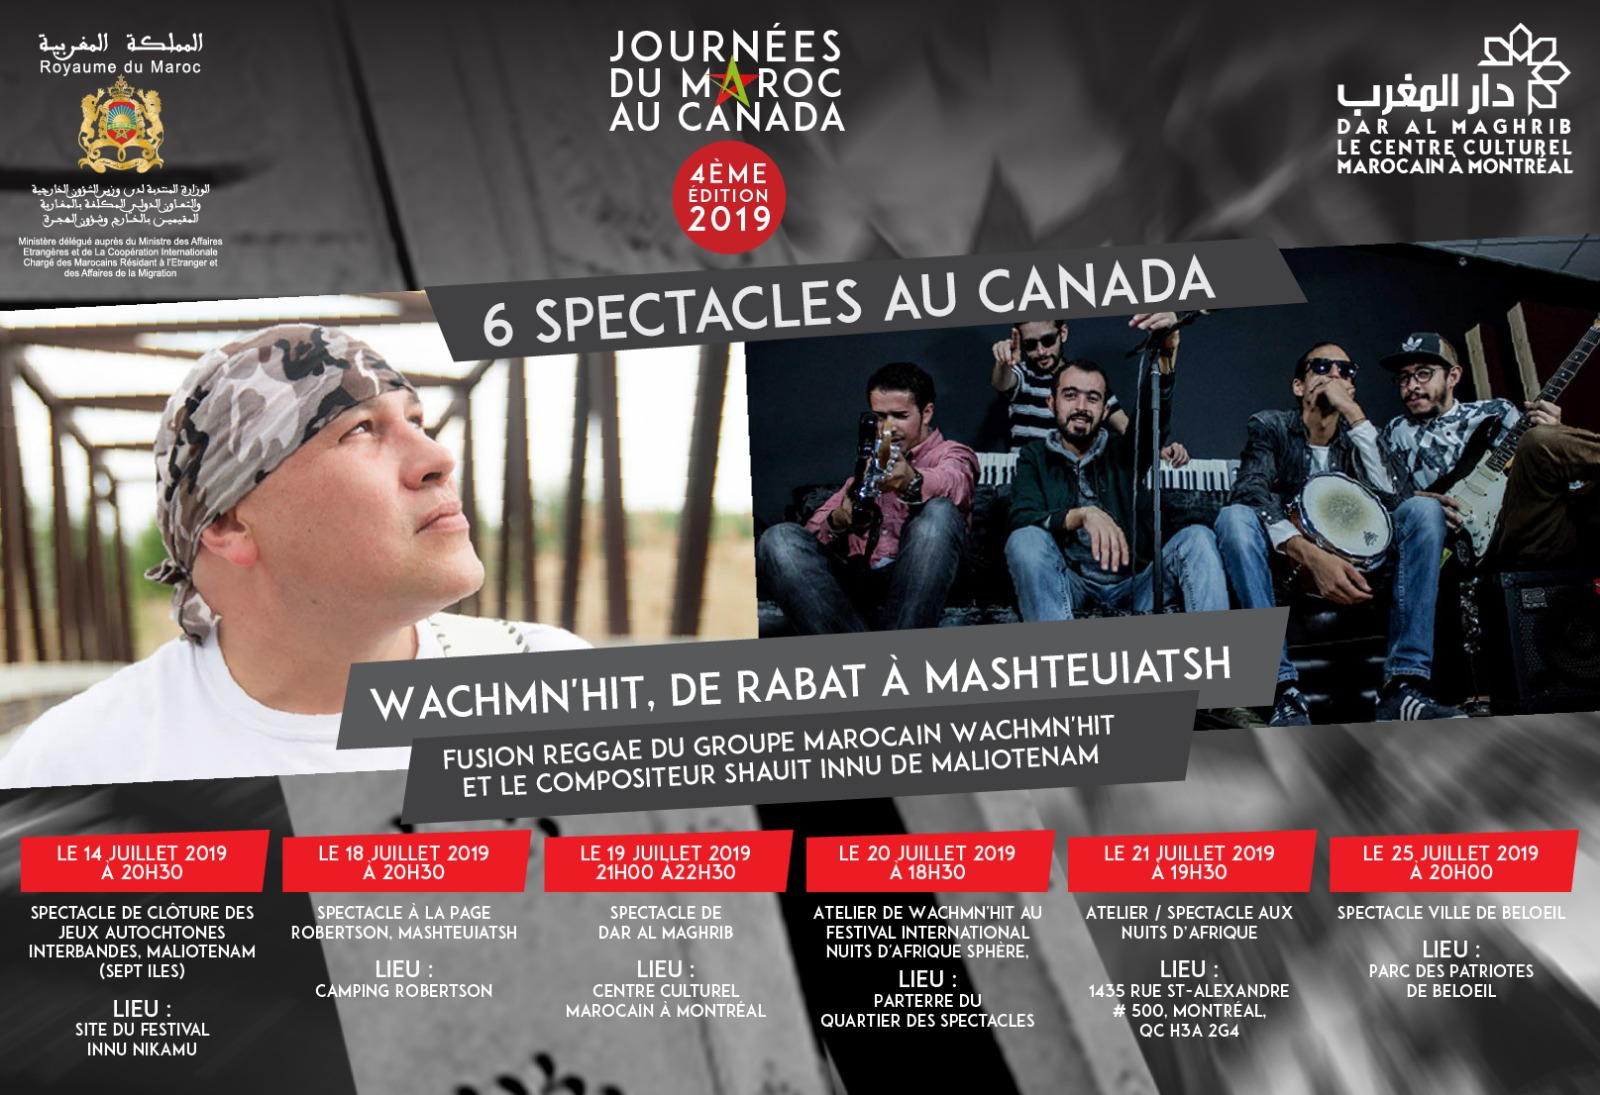 Spectacle de fusion reggae Gratuit à Dar al Maghrib